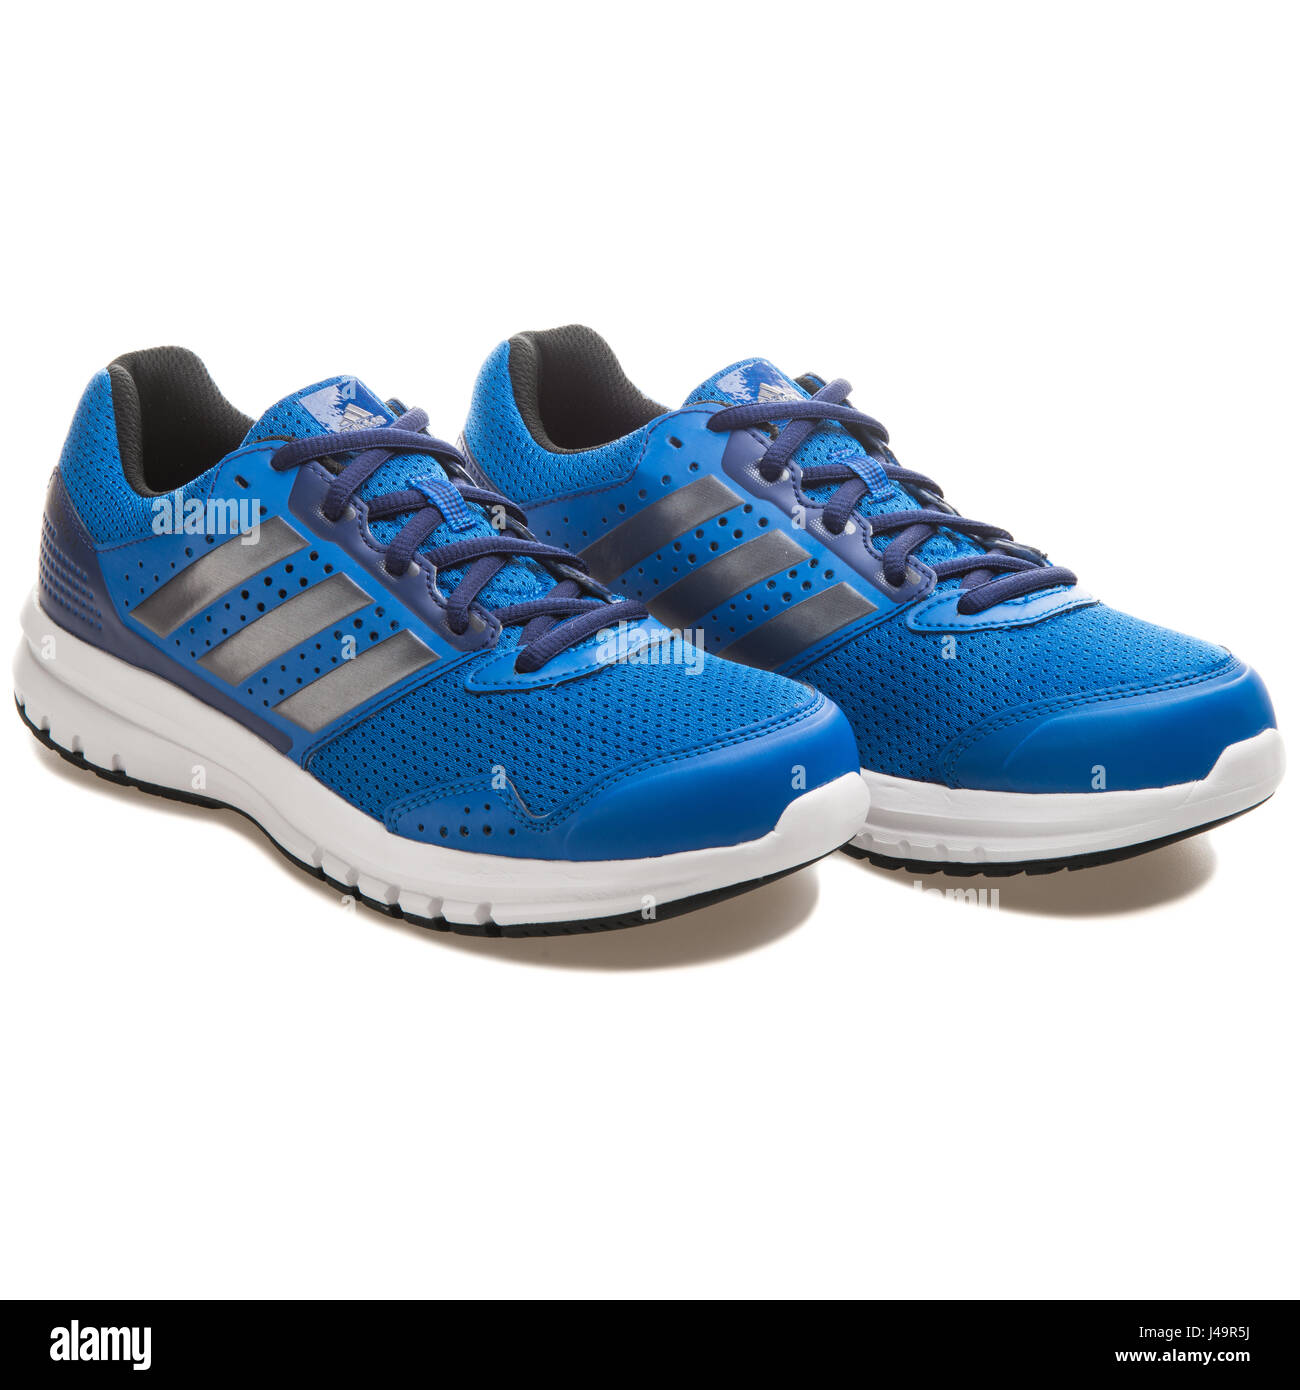 best loved b65f0 c20ee Adidas Duramo 7 k Blue - S83314